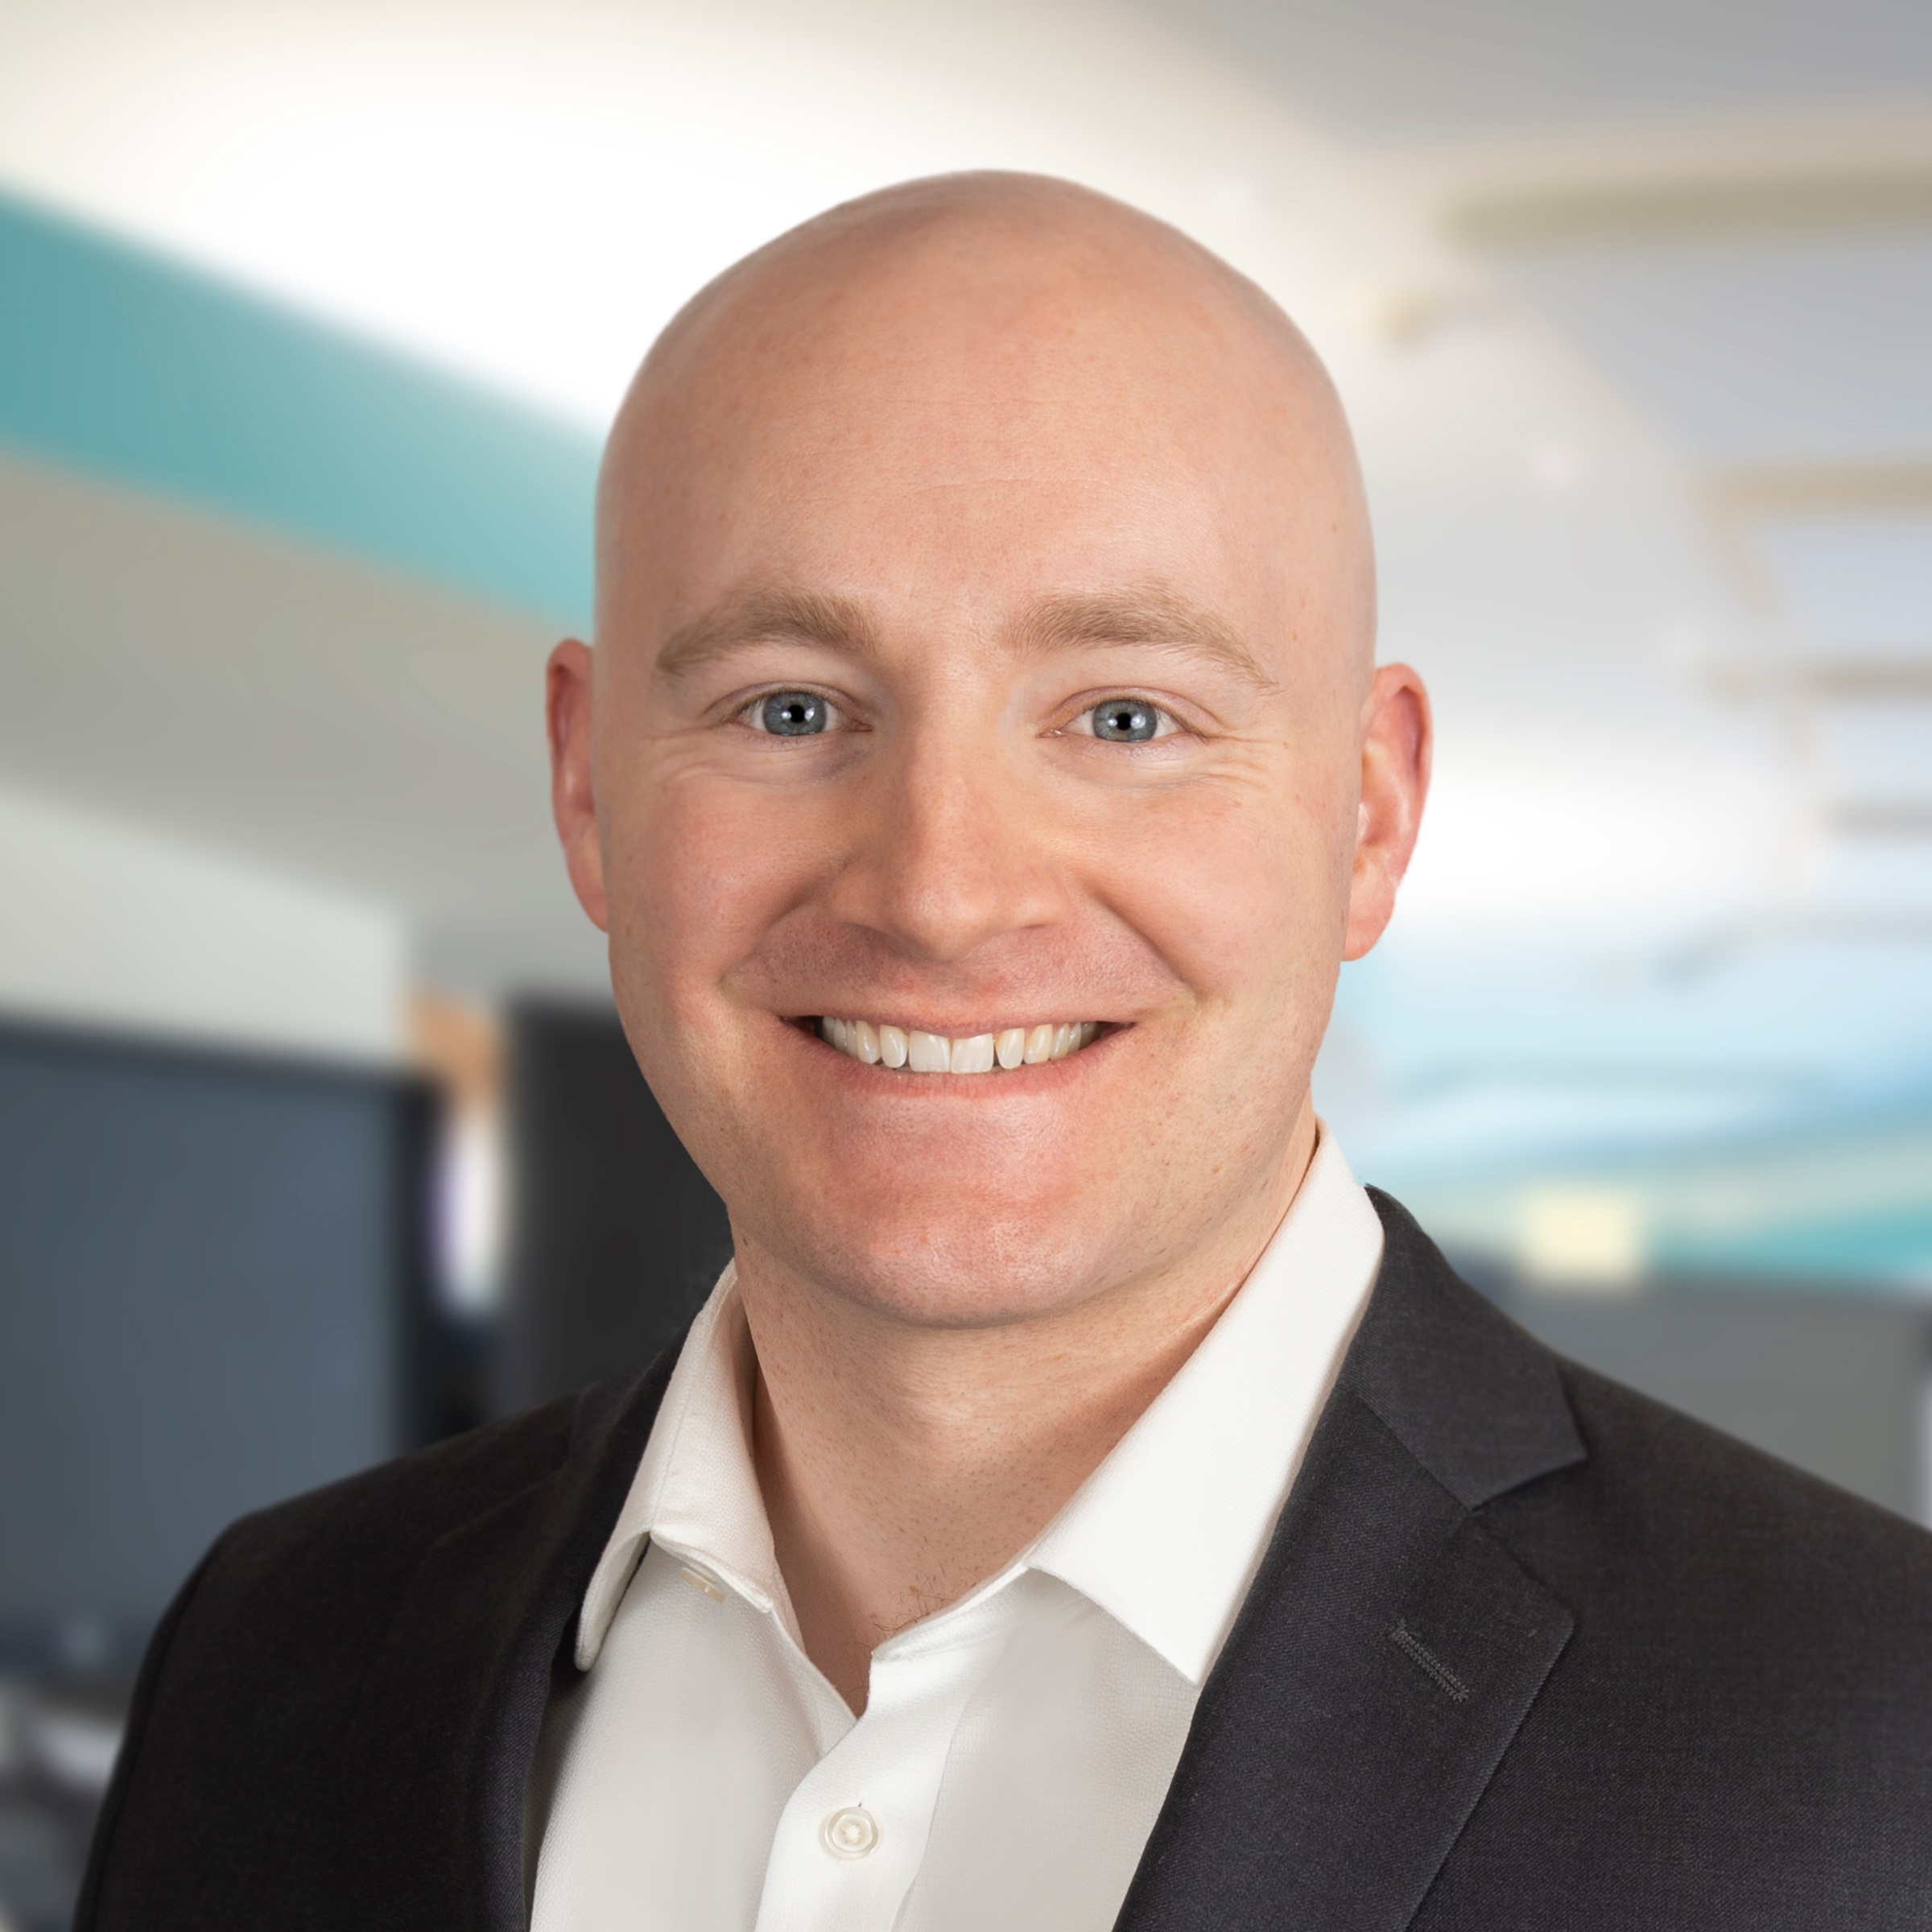 Andrew Zint   Associate, Portfolio Administration and Client Service